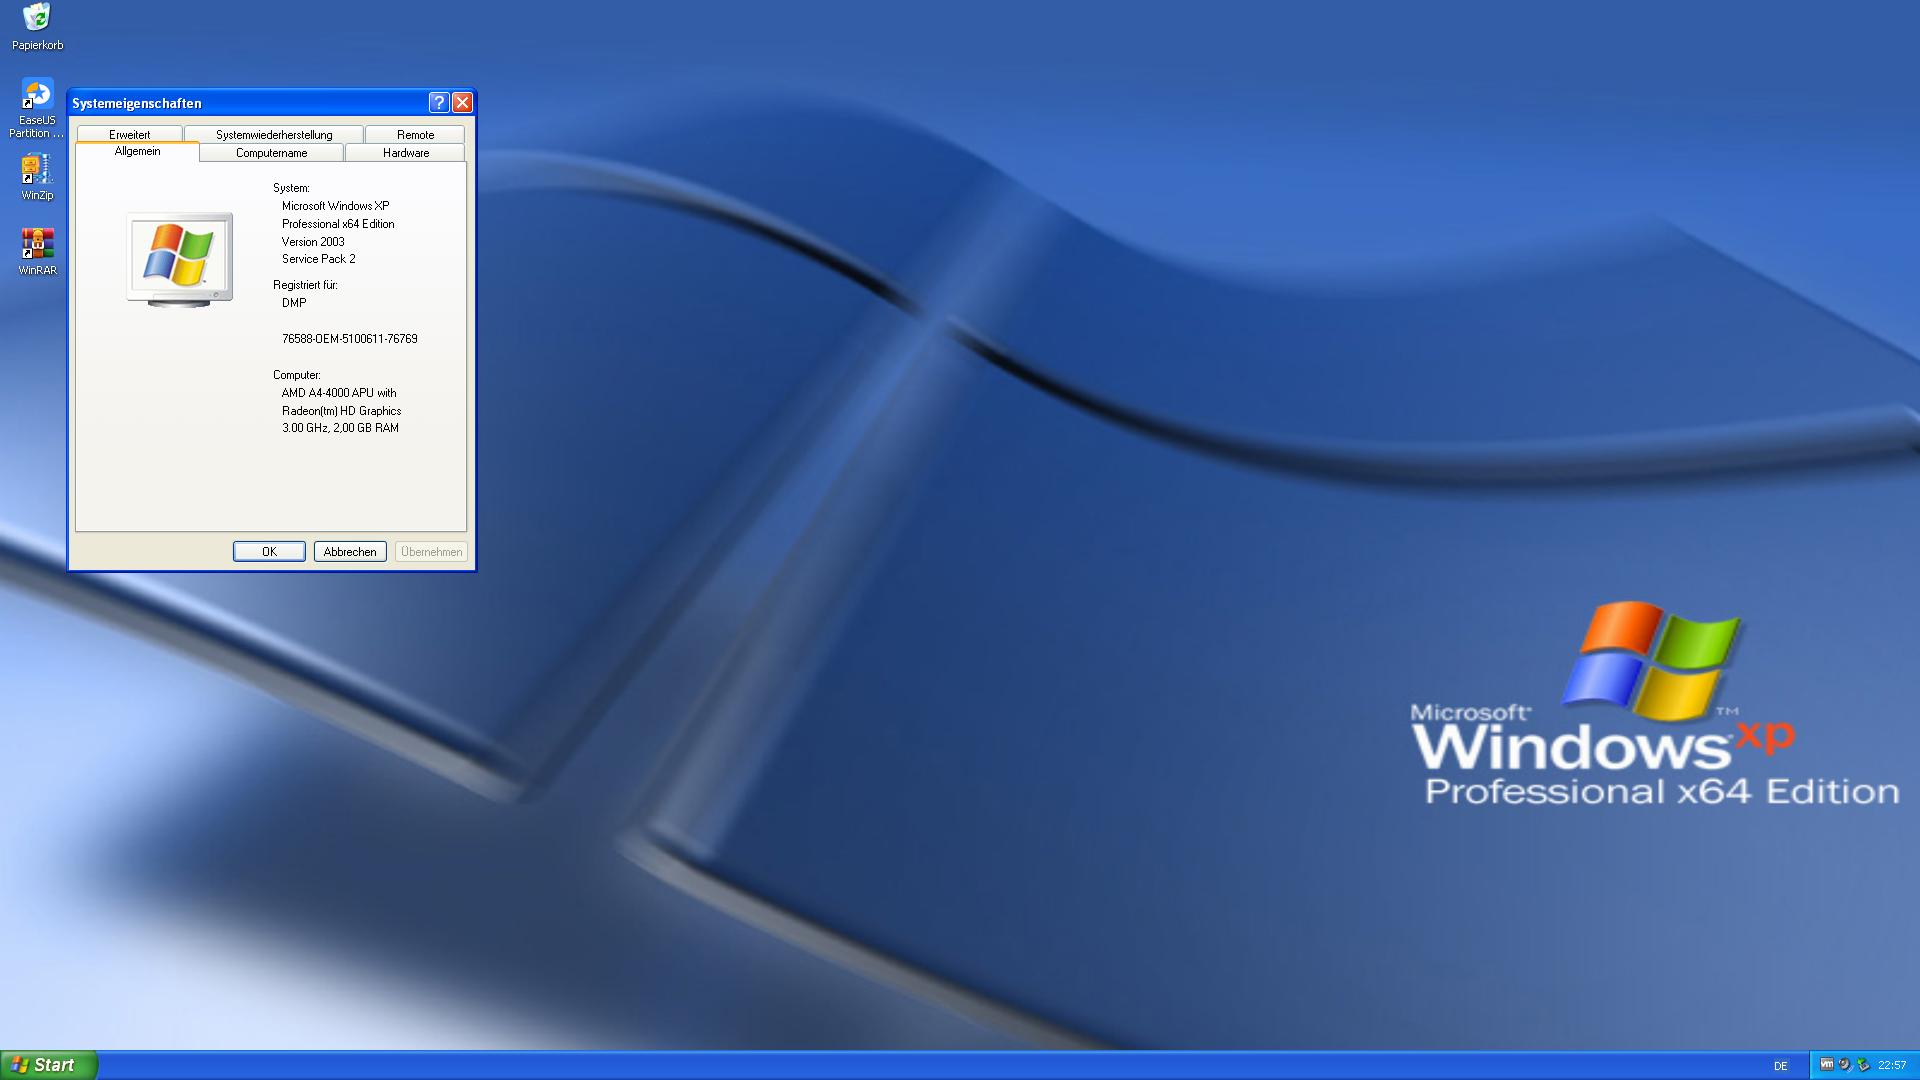 [Bild: Windows+XP+Professional+x64+Edition-2018...-57-33.png]